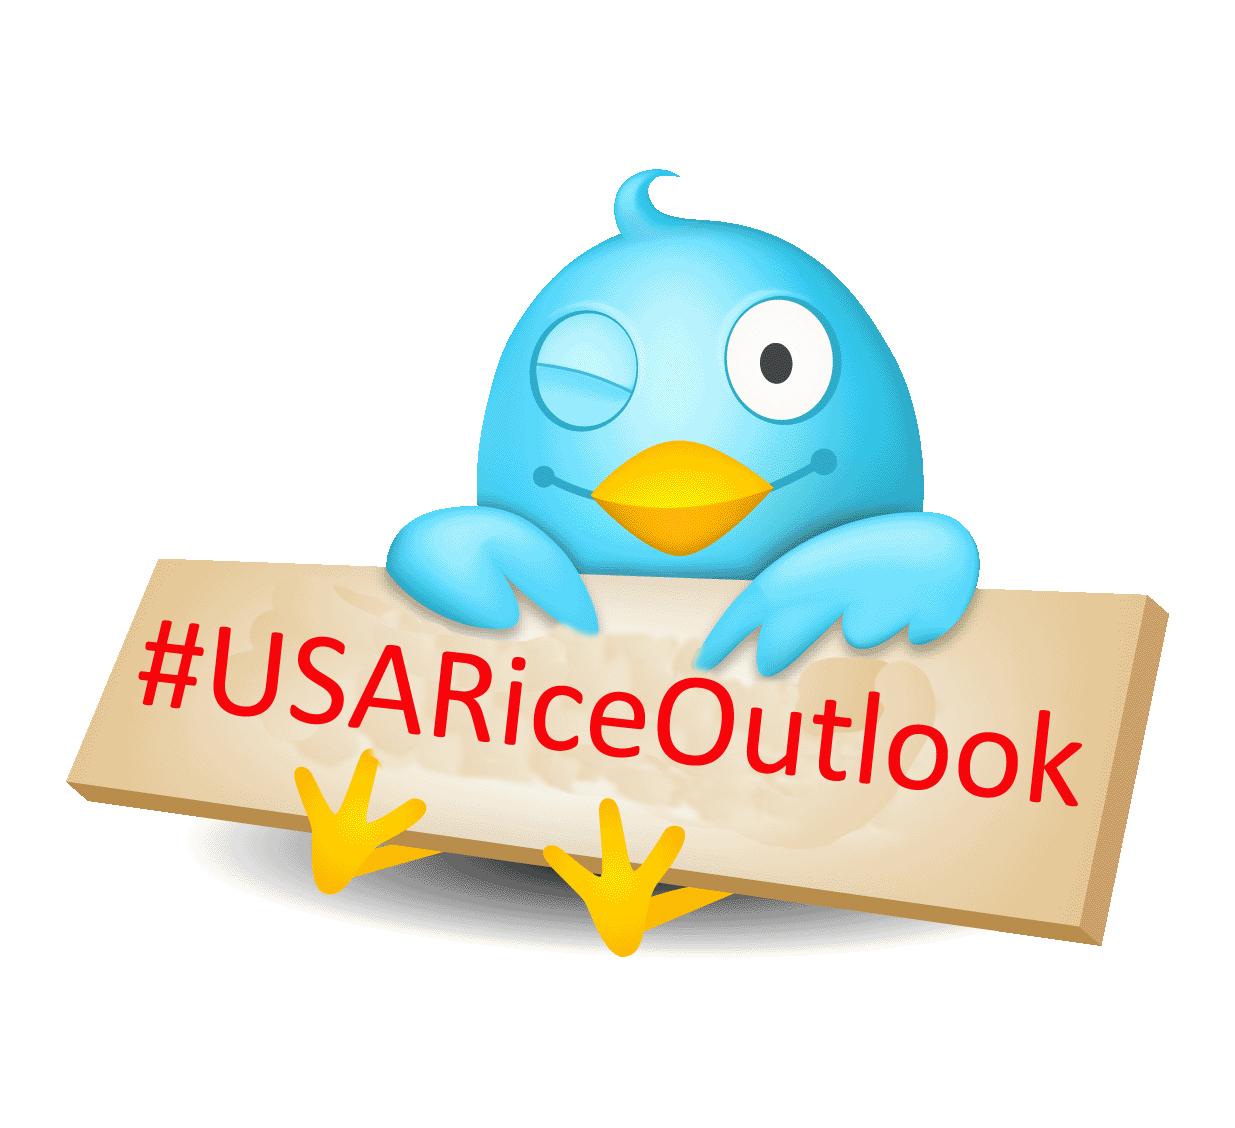 U.S. Rice - the feel good food